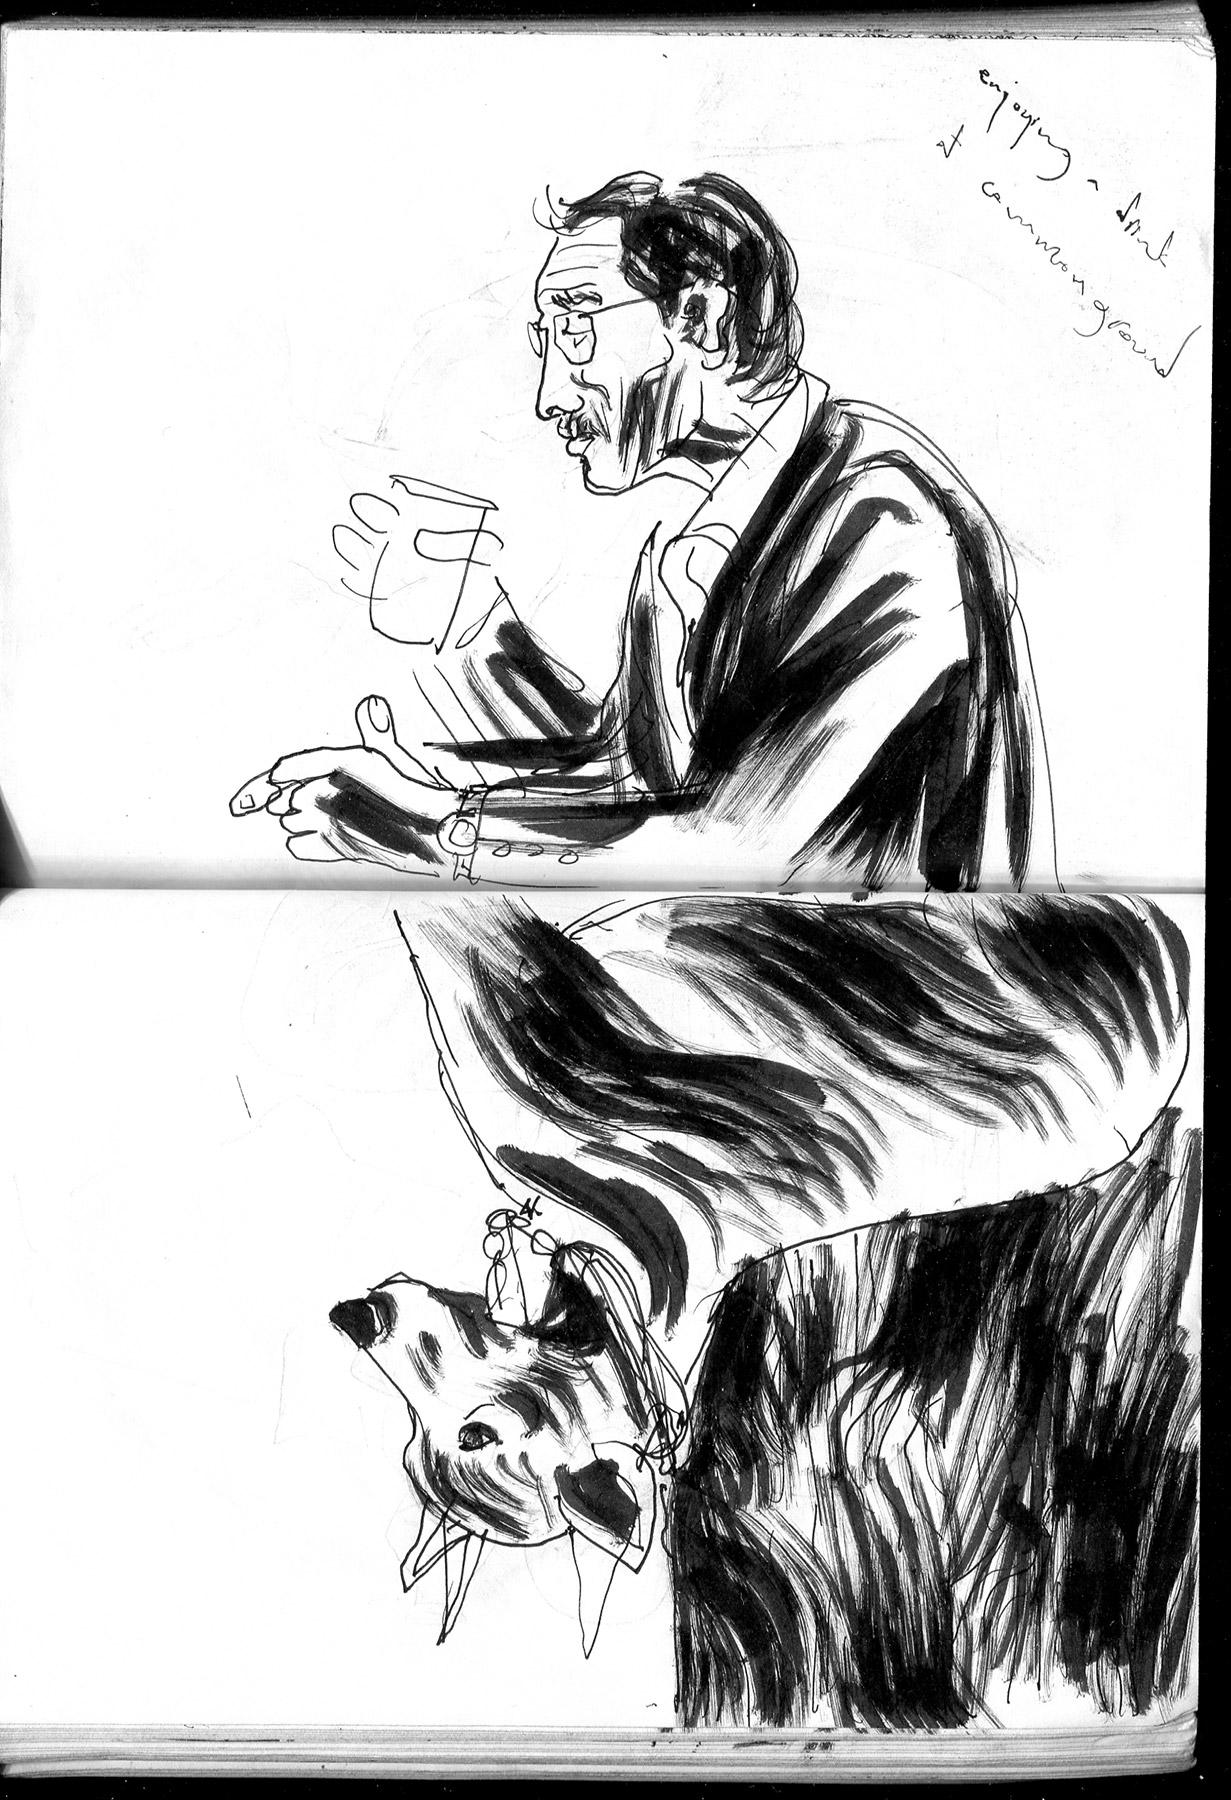 davidm_sketches_2014_08-029.jpg